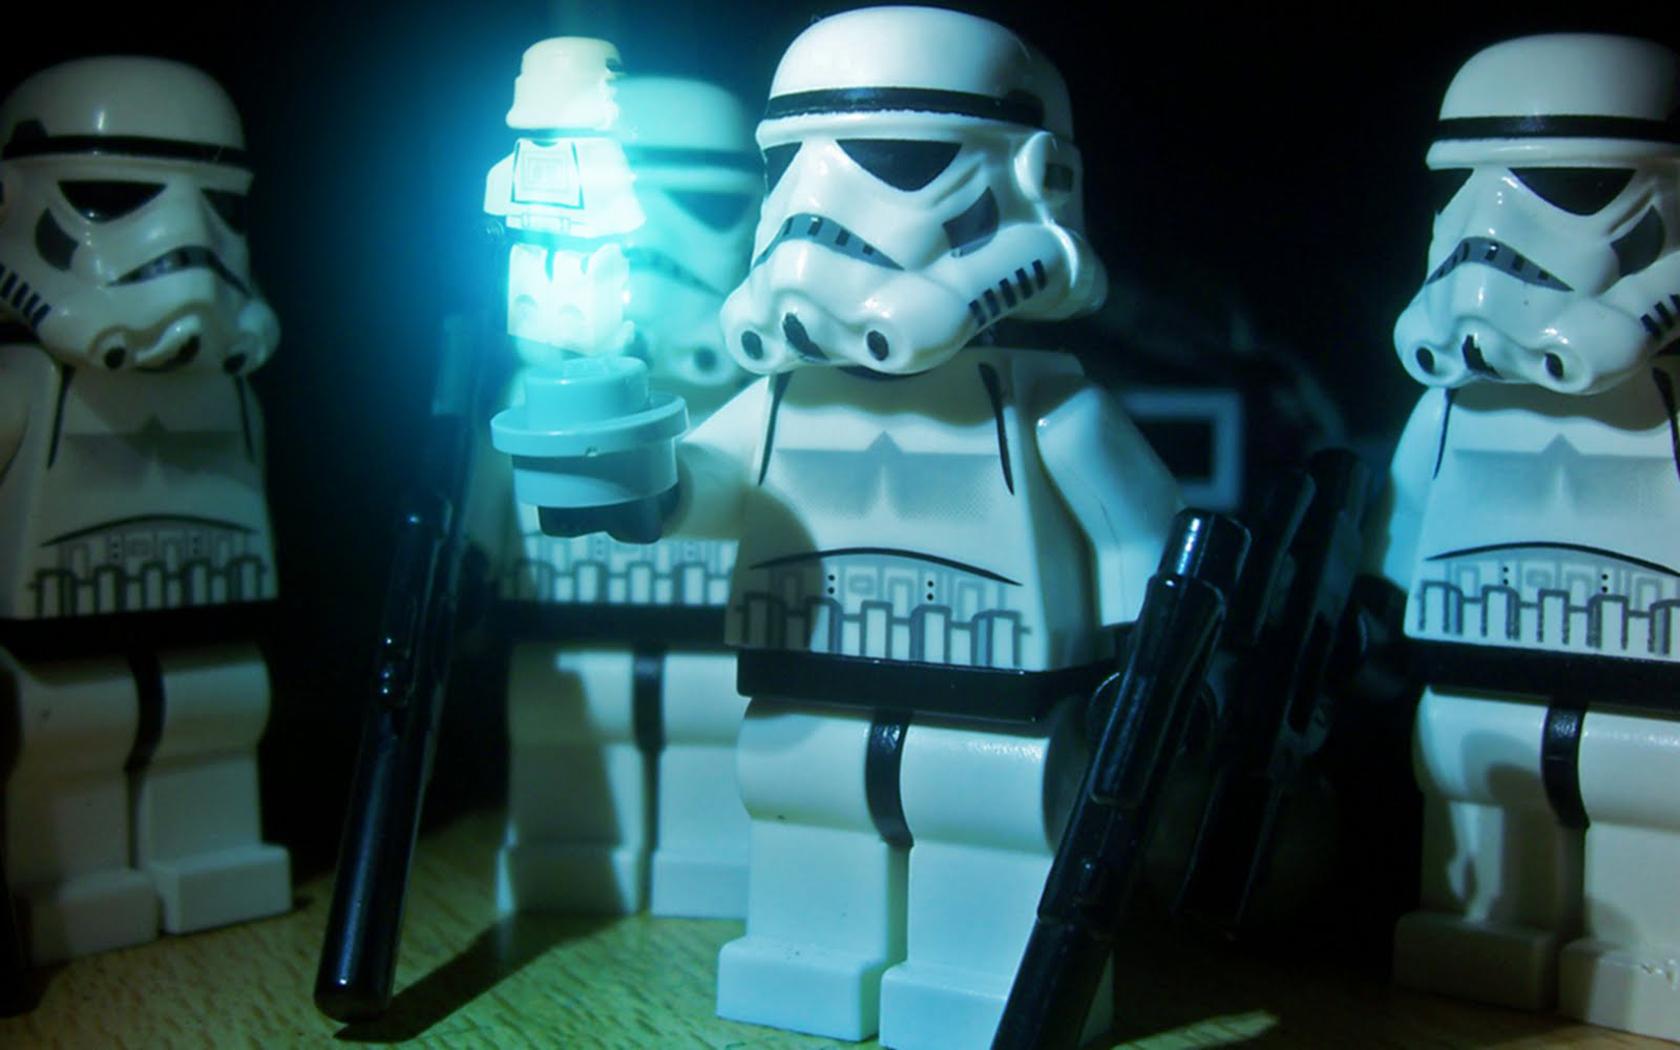 50 Lego Star Wars Wallpapers On Wallpapersafari